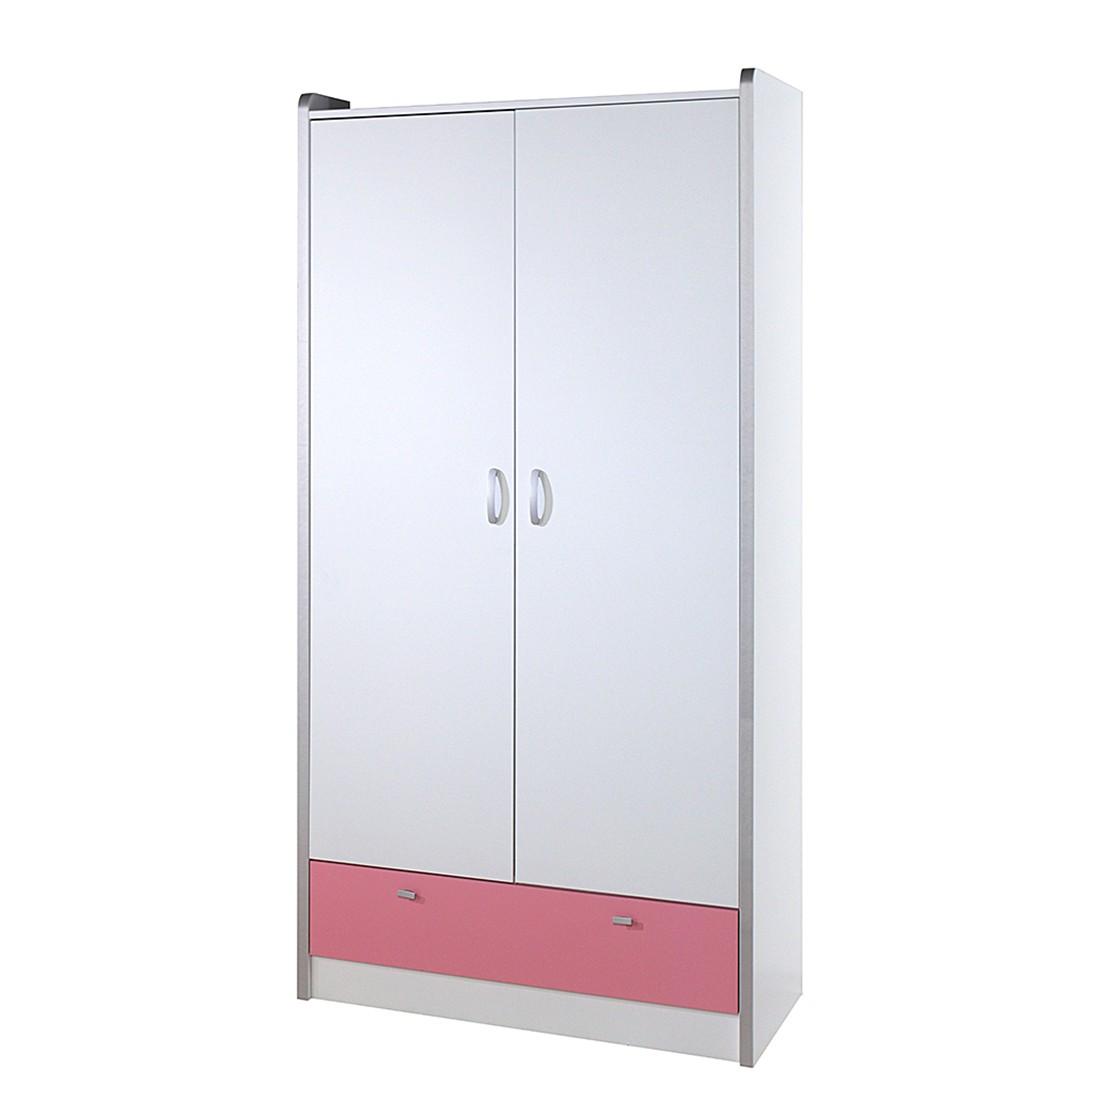 Kleiderschrank Bonny - Weiß/Rosa, Relita